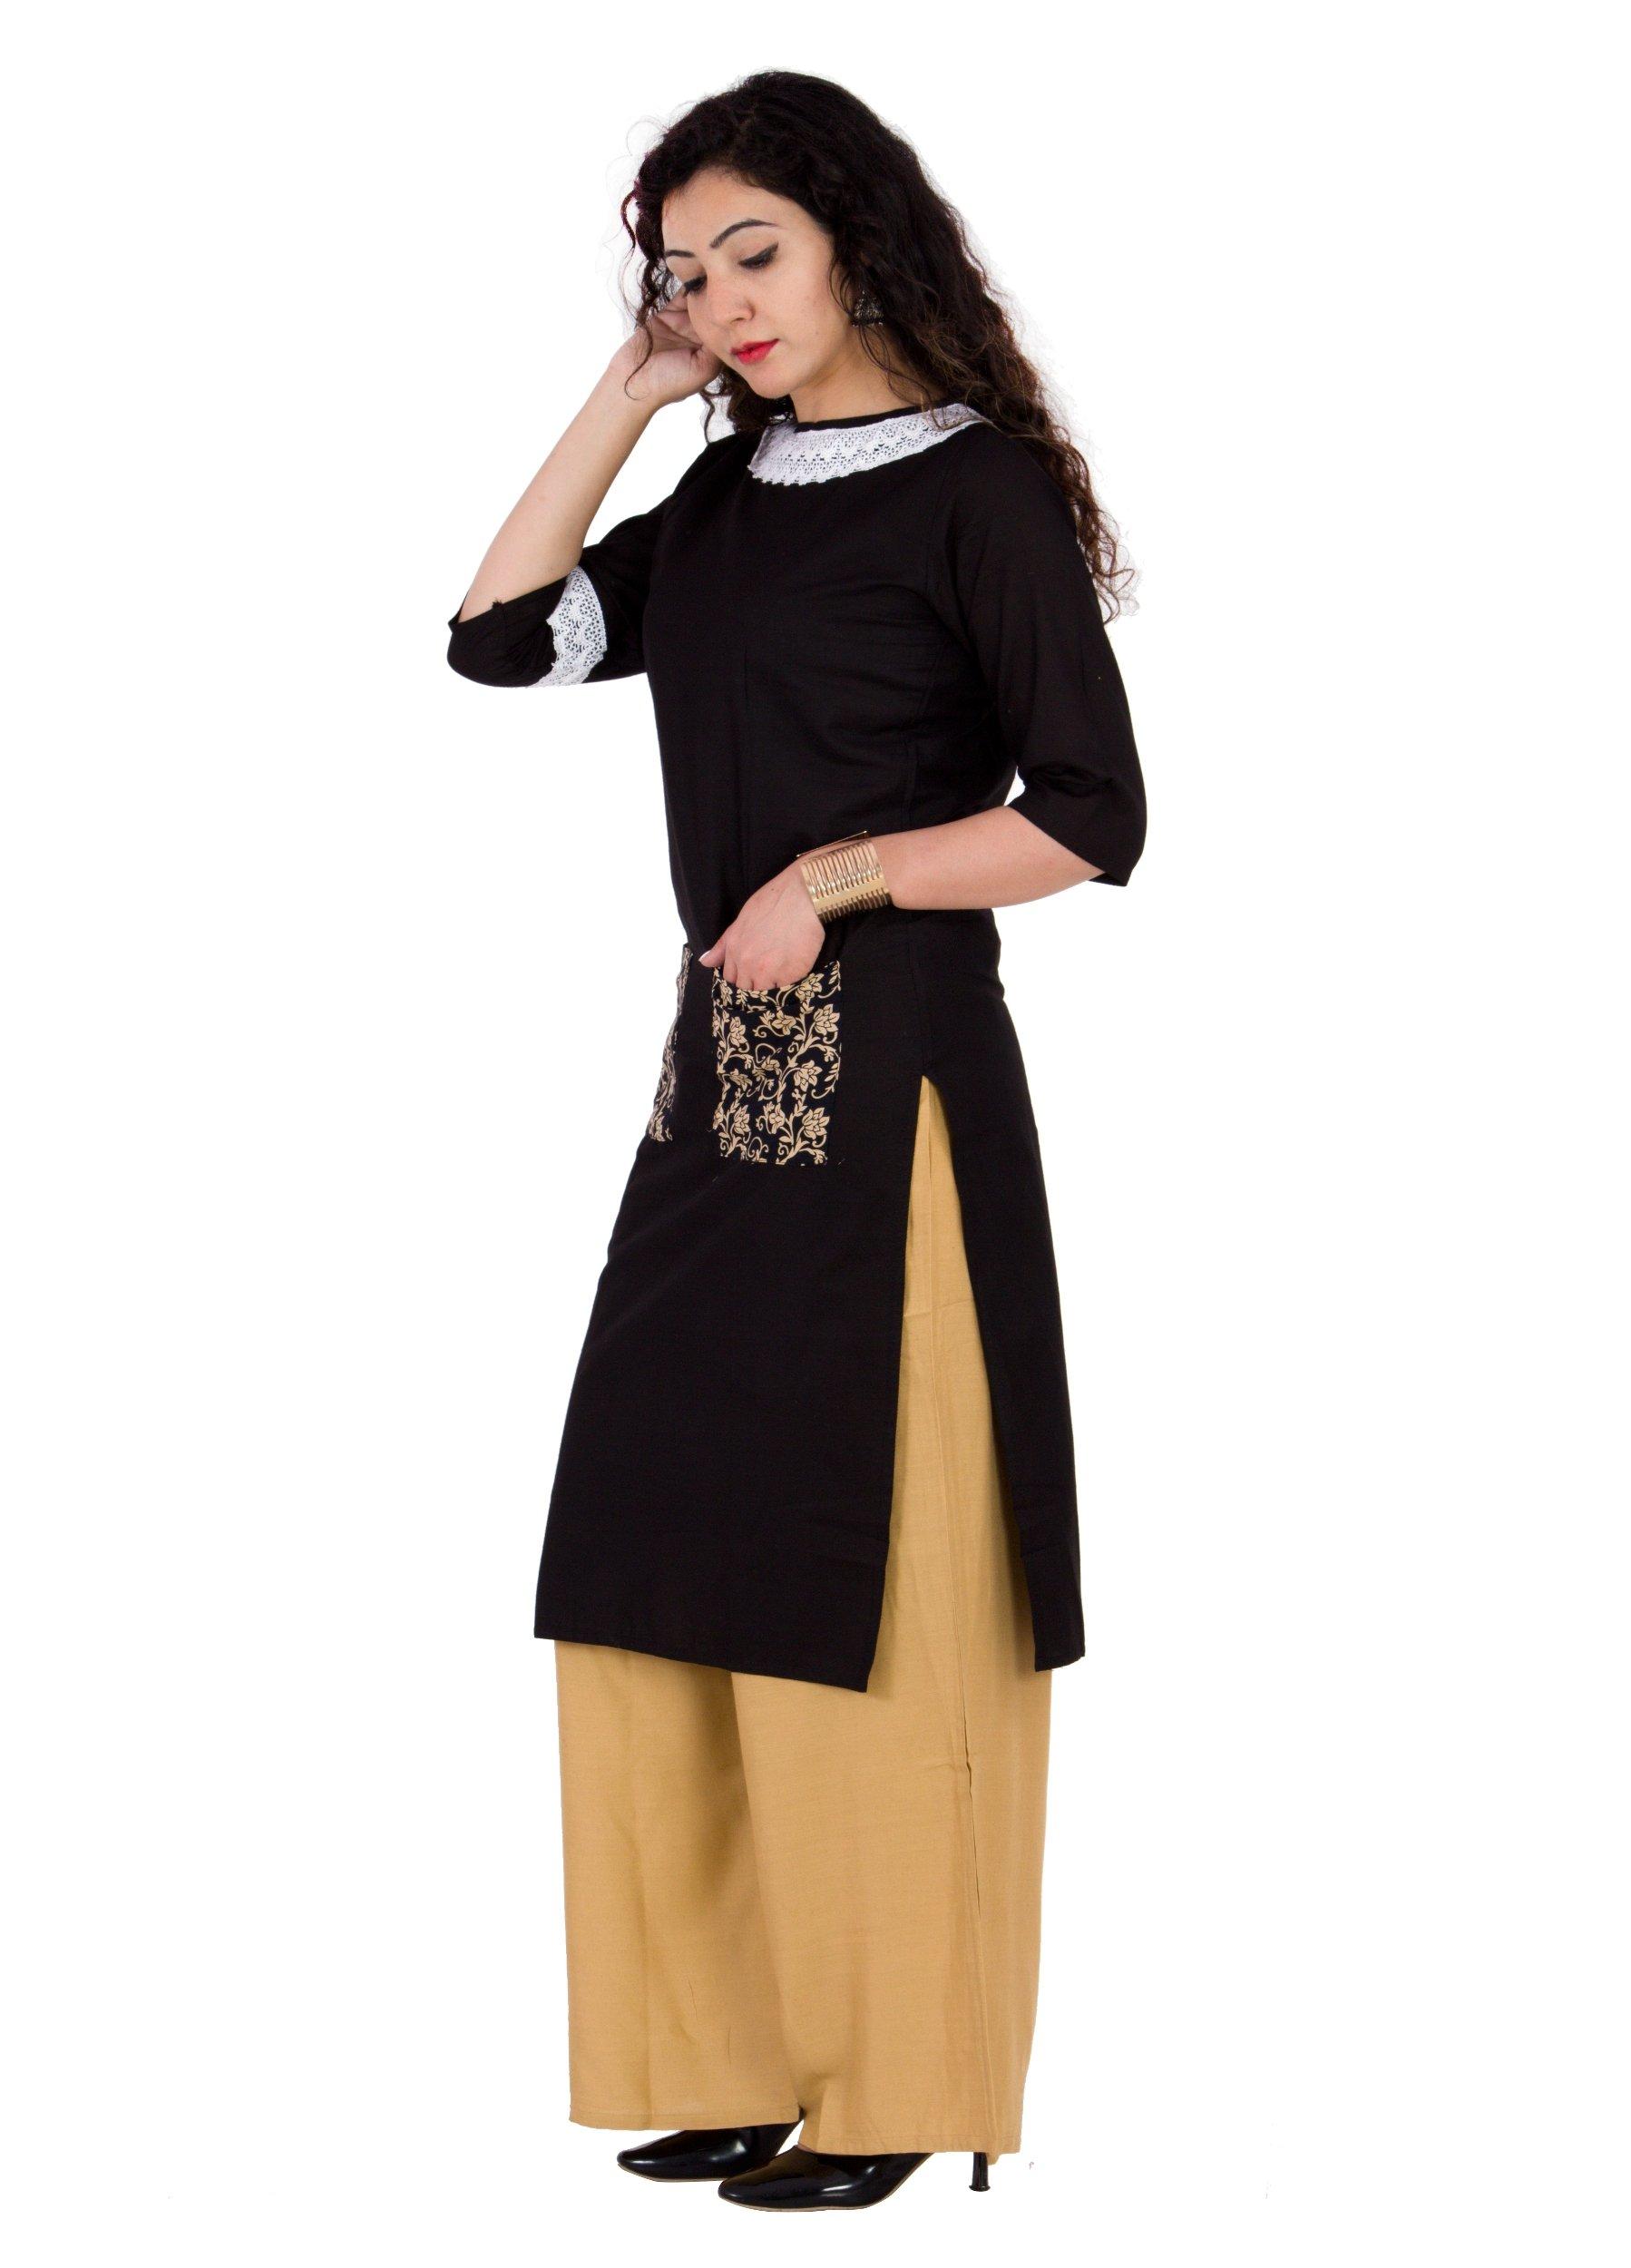 BrightJet Designer Black Cotton Lacework Women Fashion Kurti A-line Kurta Top Tunic with Rayon Solid Beige Plazzo Set Party Dress Casual (XXL) by BrightJet (Image #3)